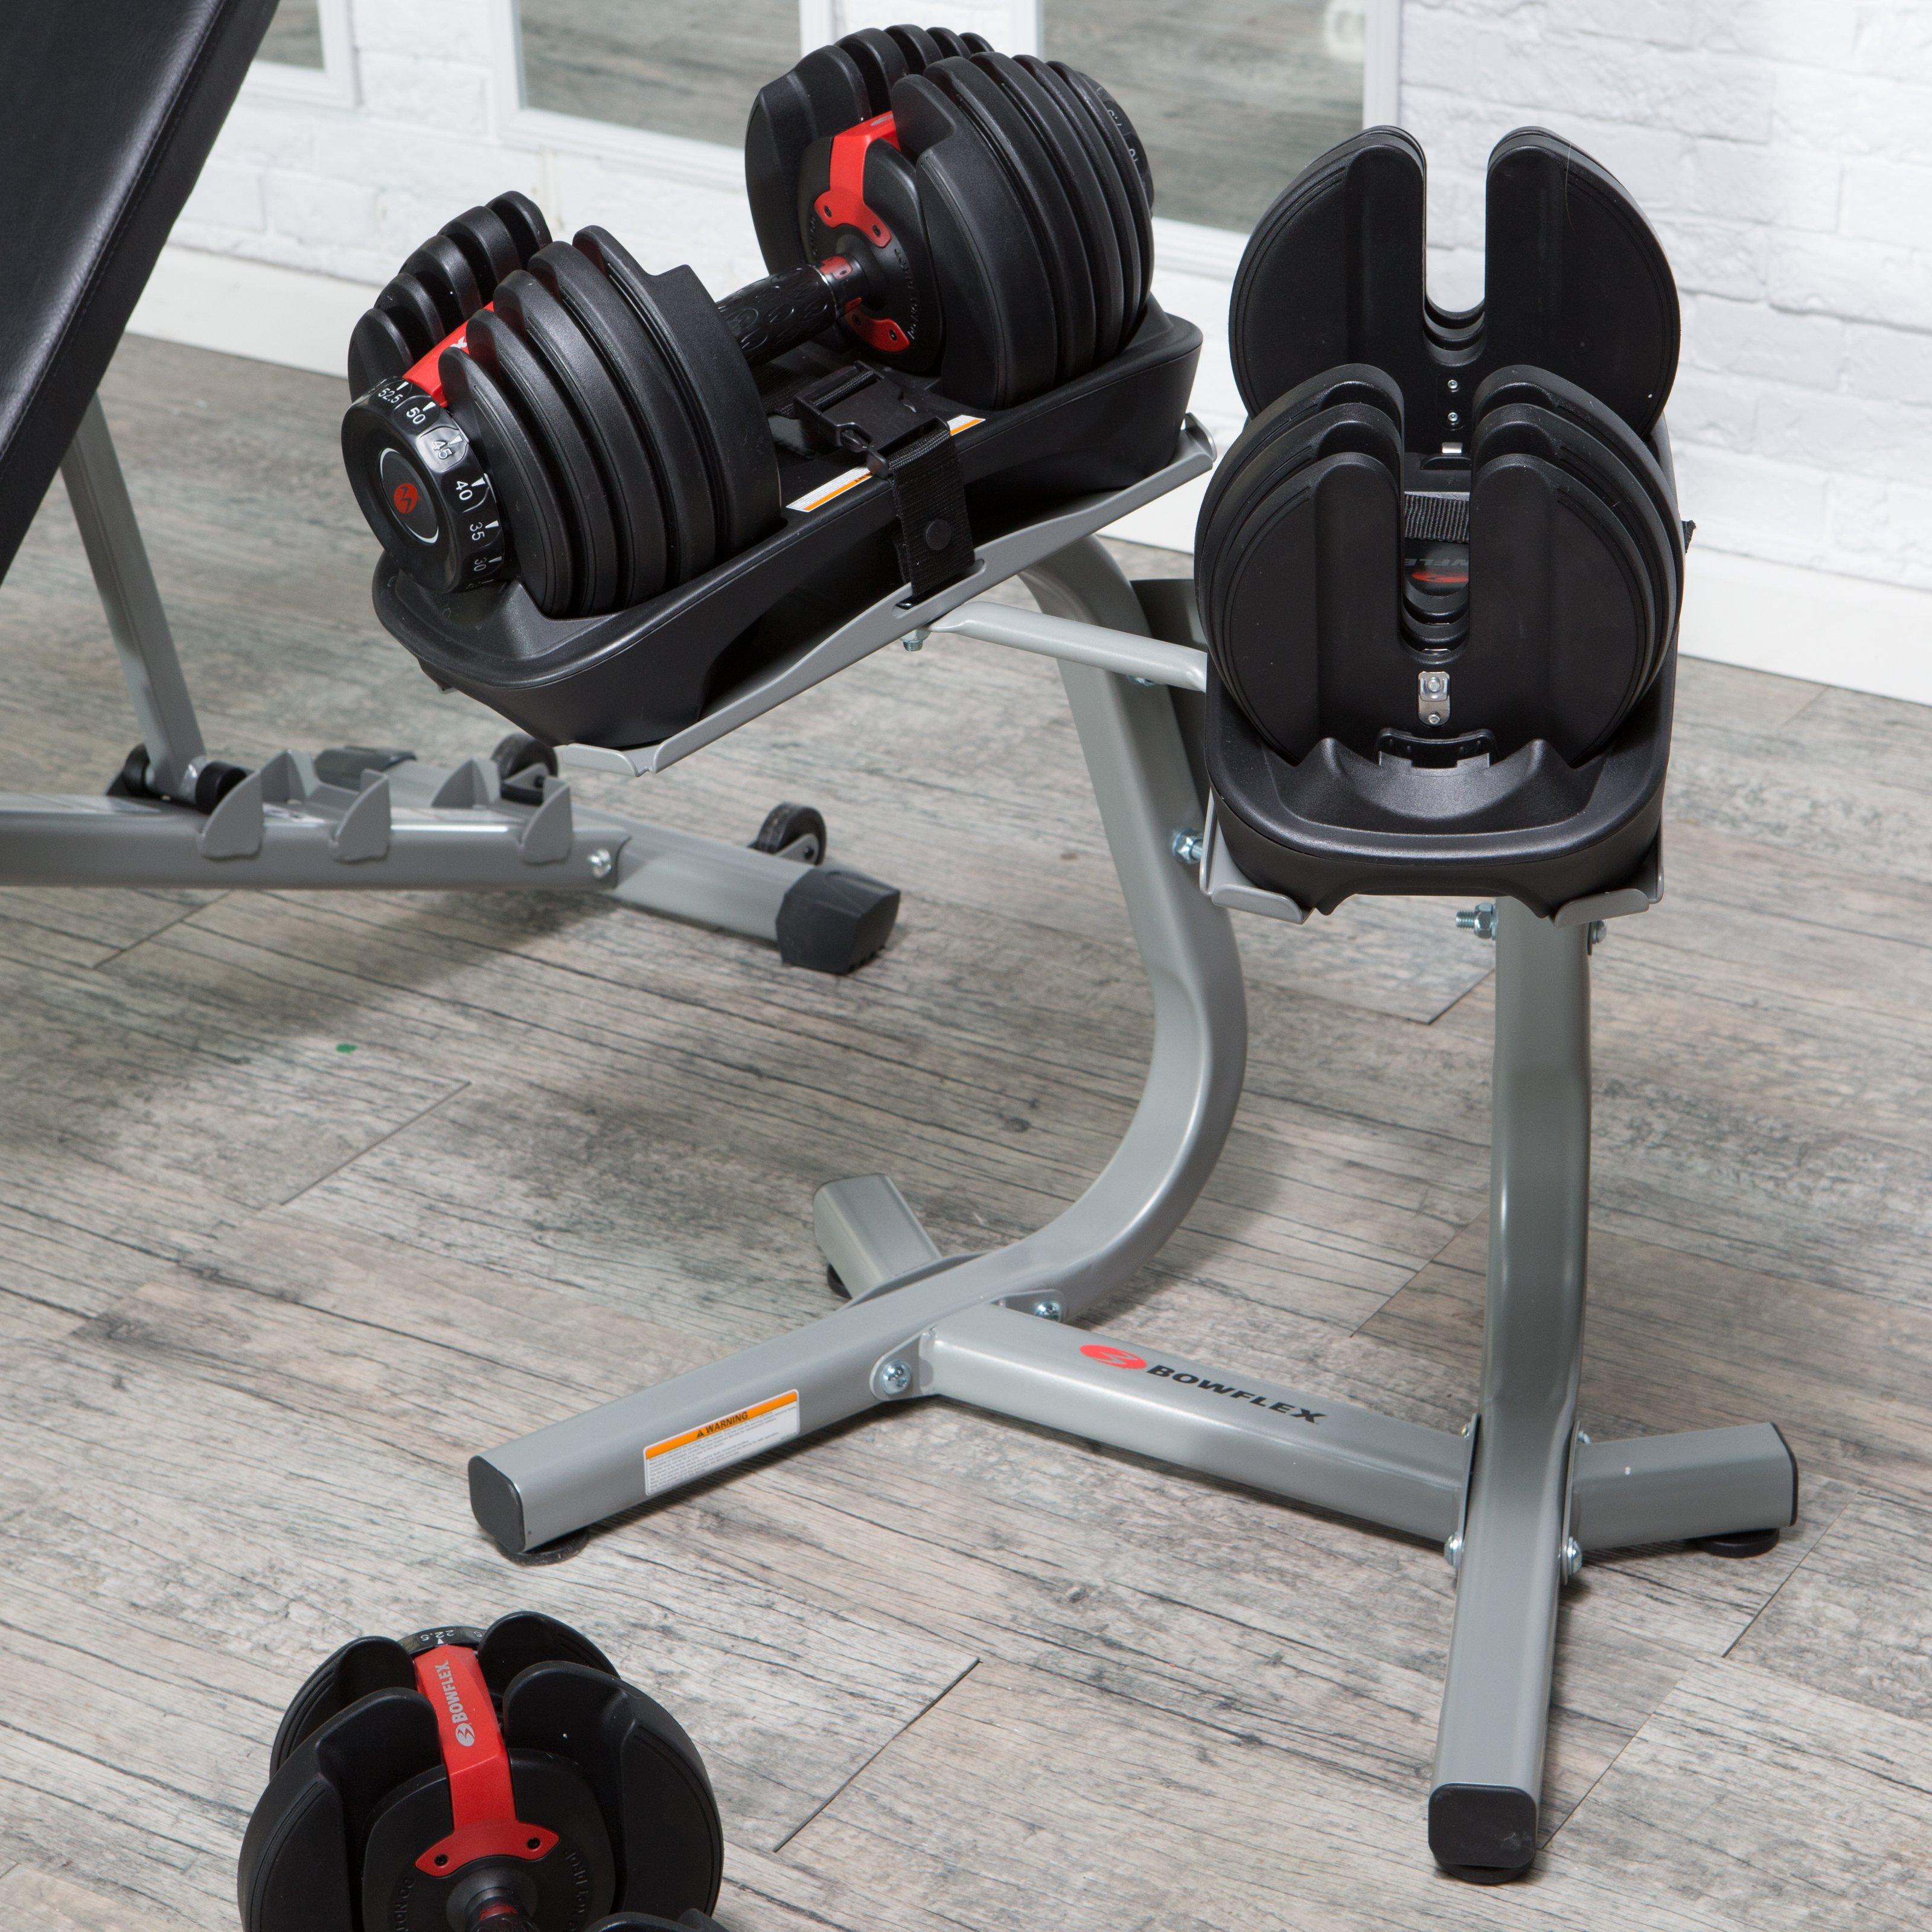 Hoist Gym Equipment Dubai: Bowflex Dumbbells Full Body Workout